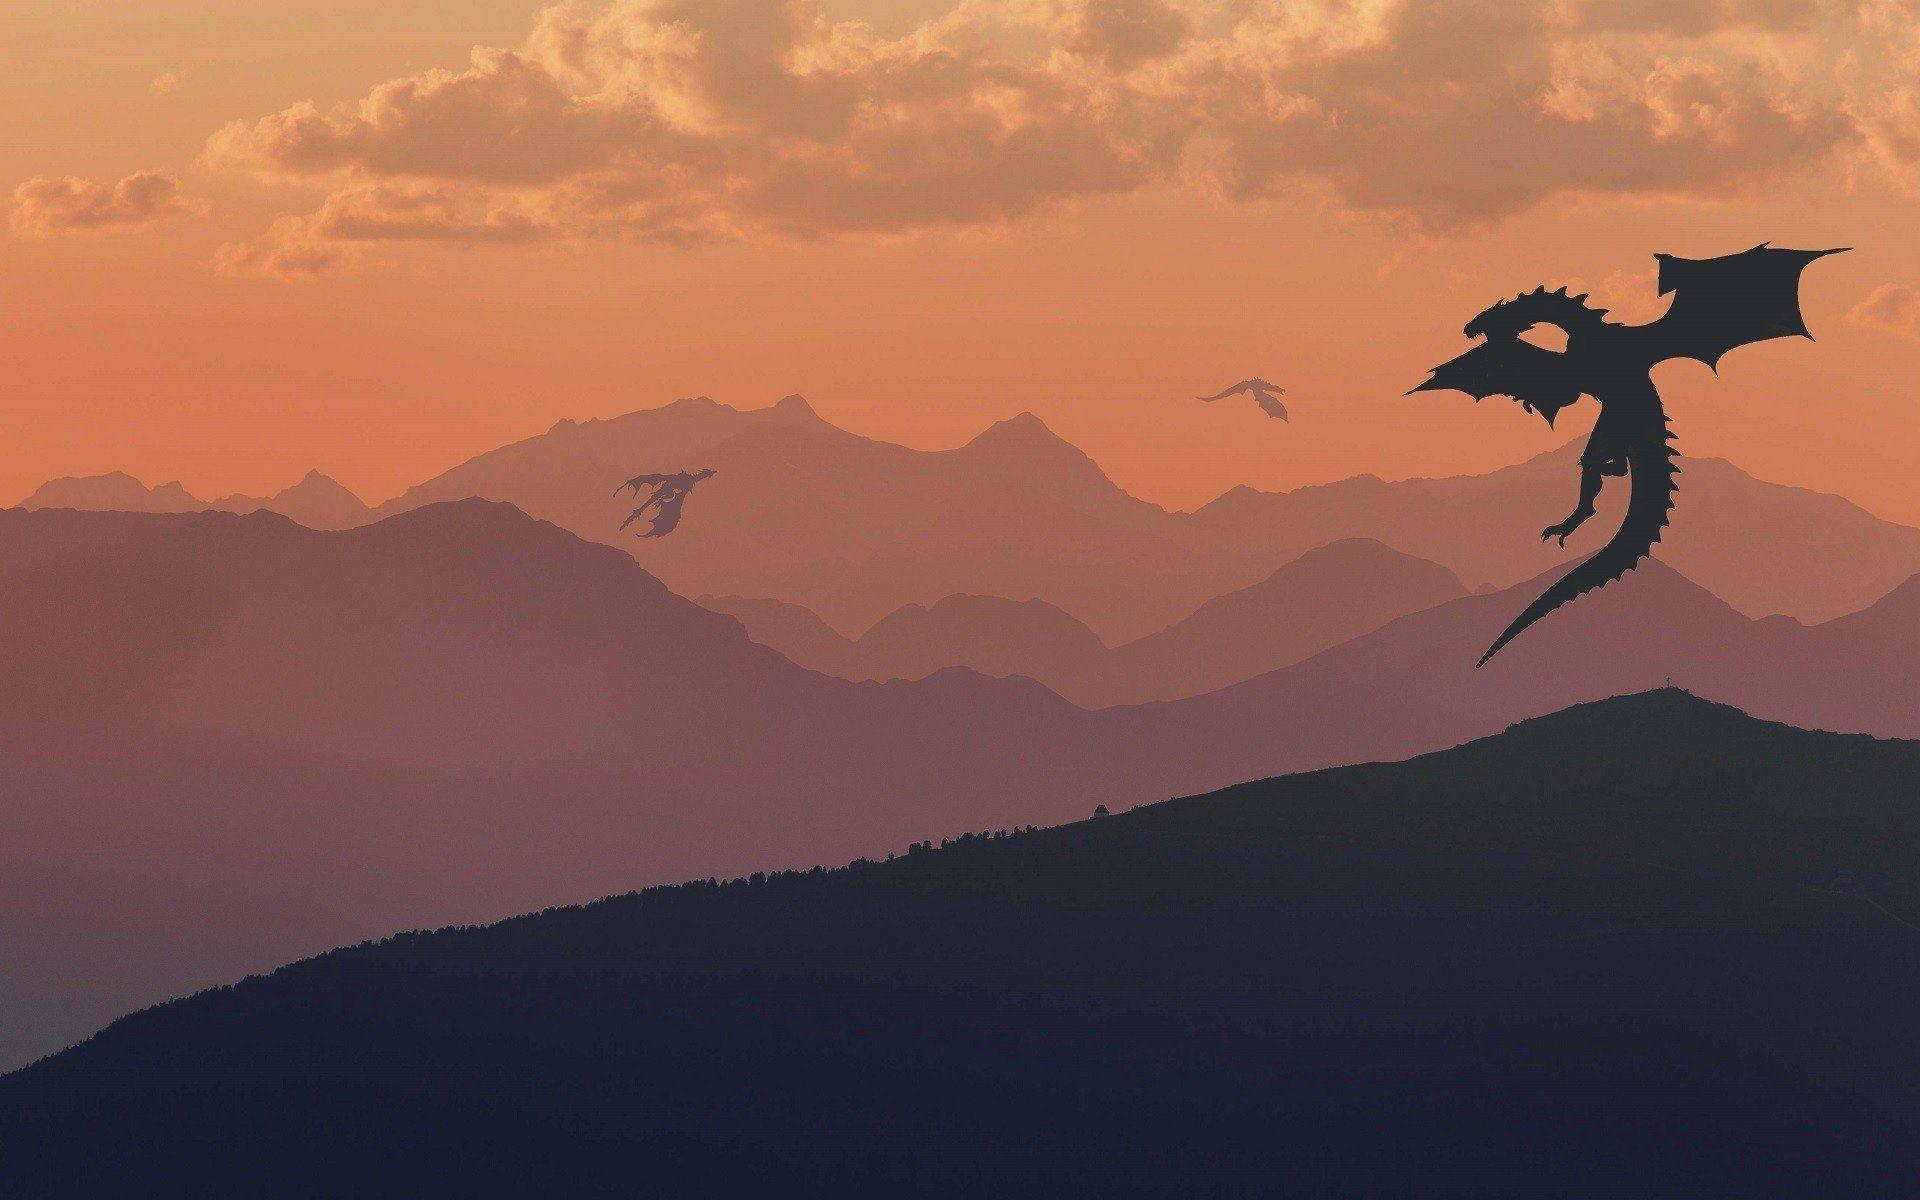 Game of Thrones landscape art minimalist